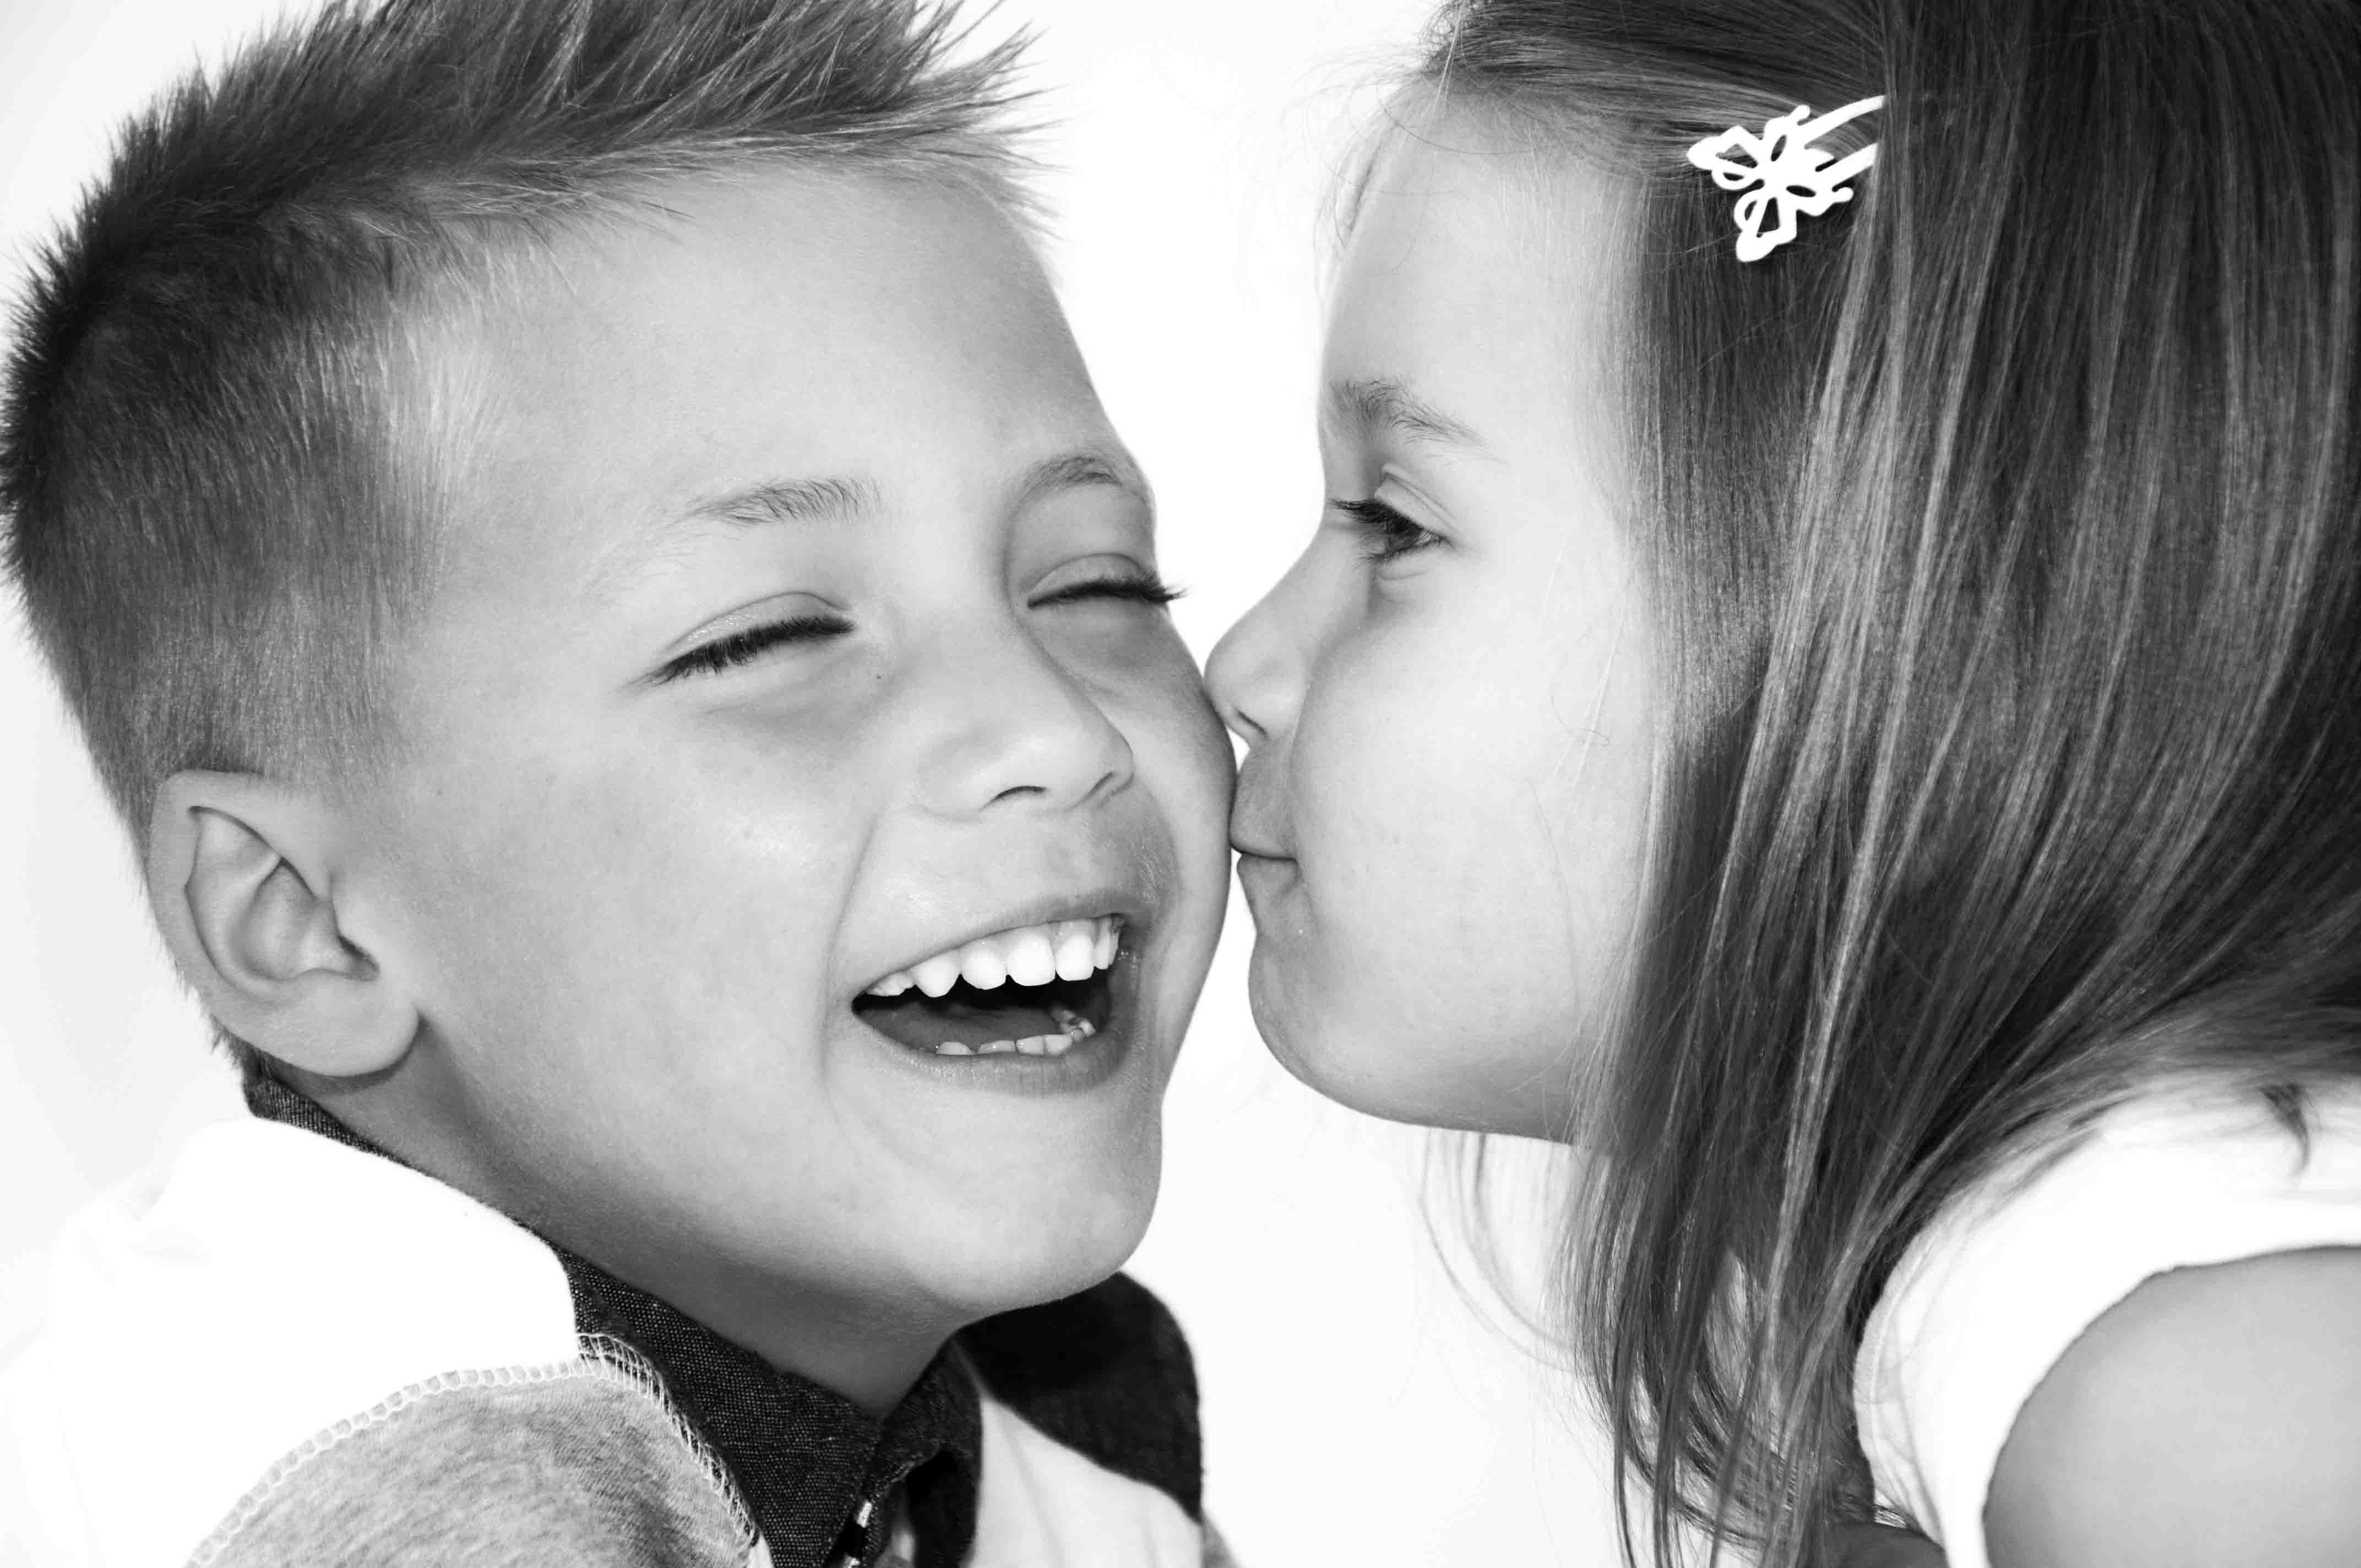 Sibling's kiss